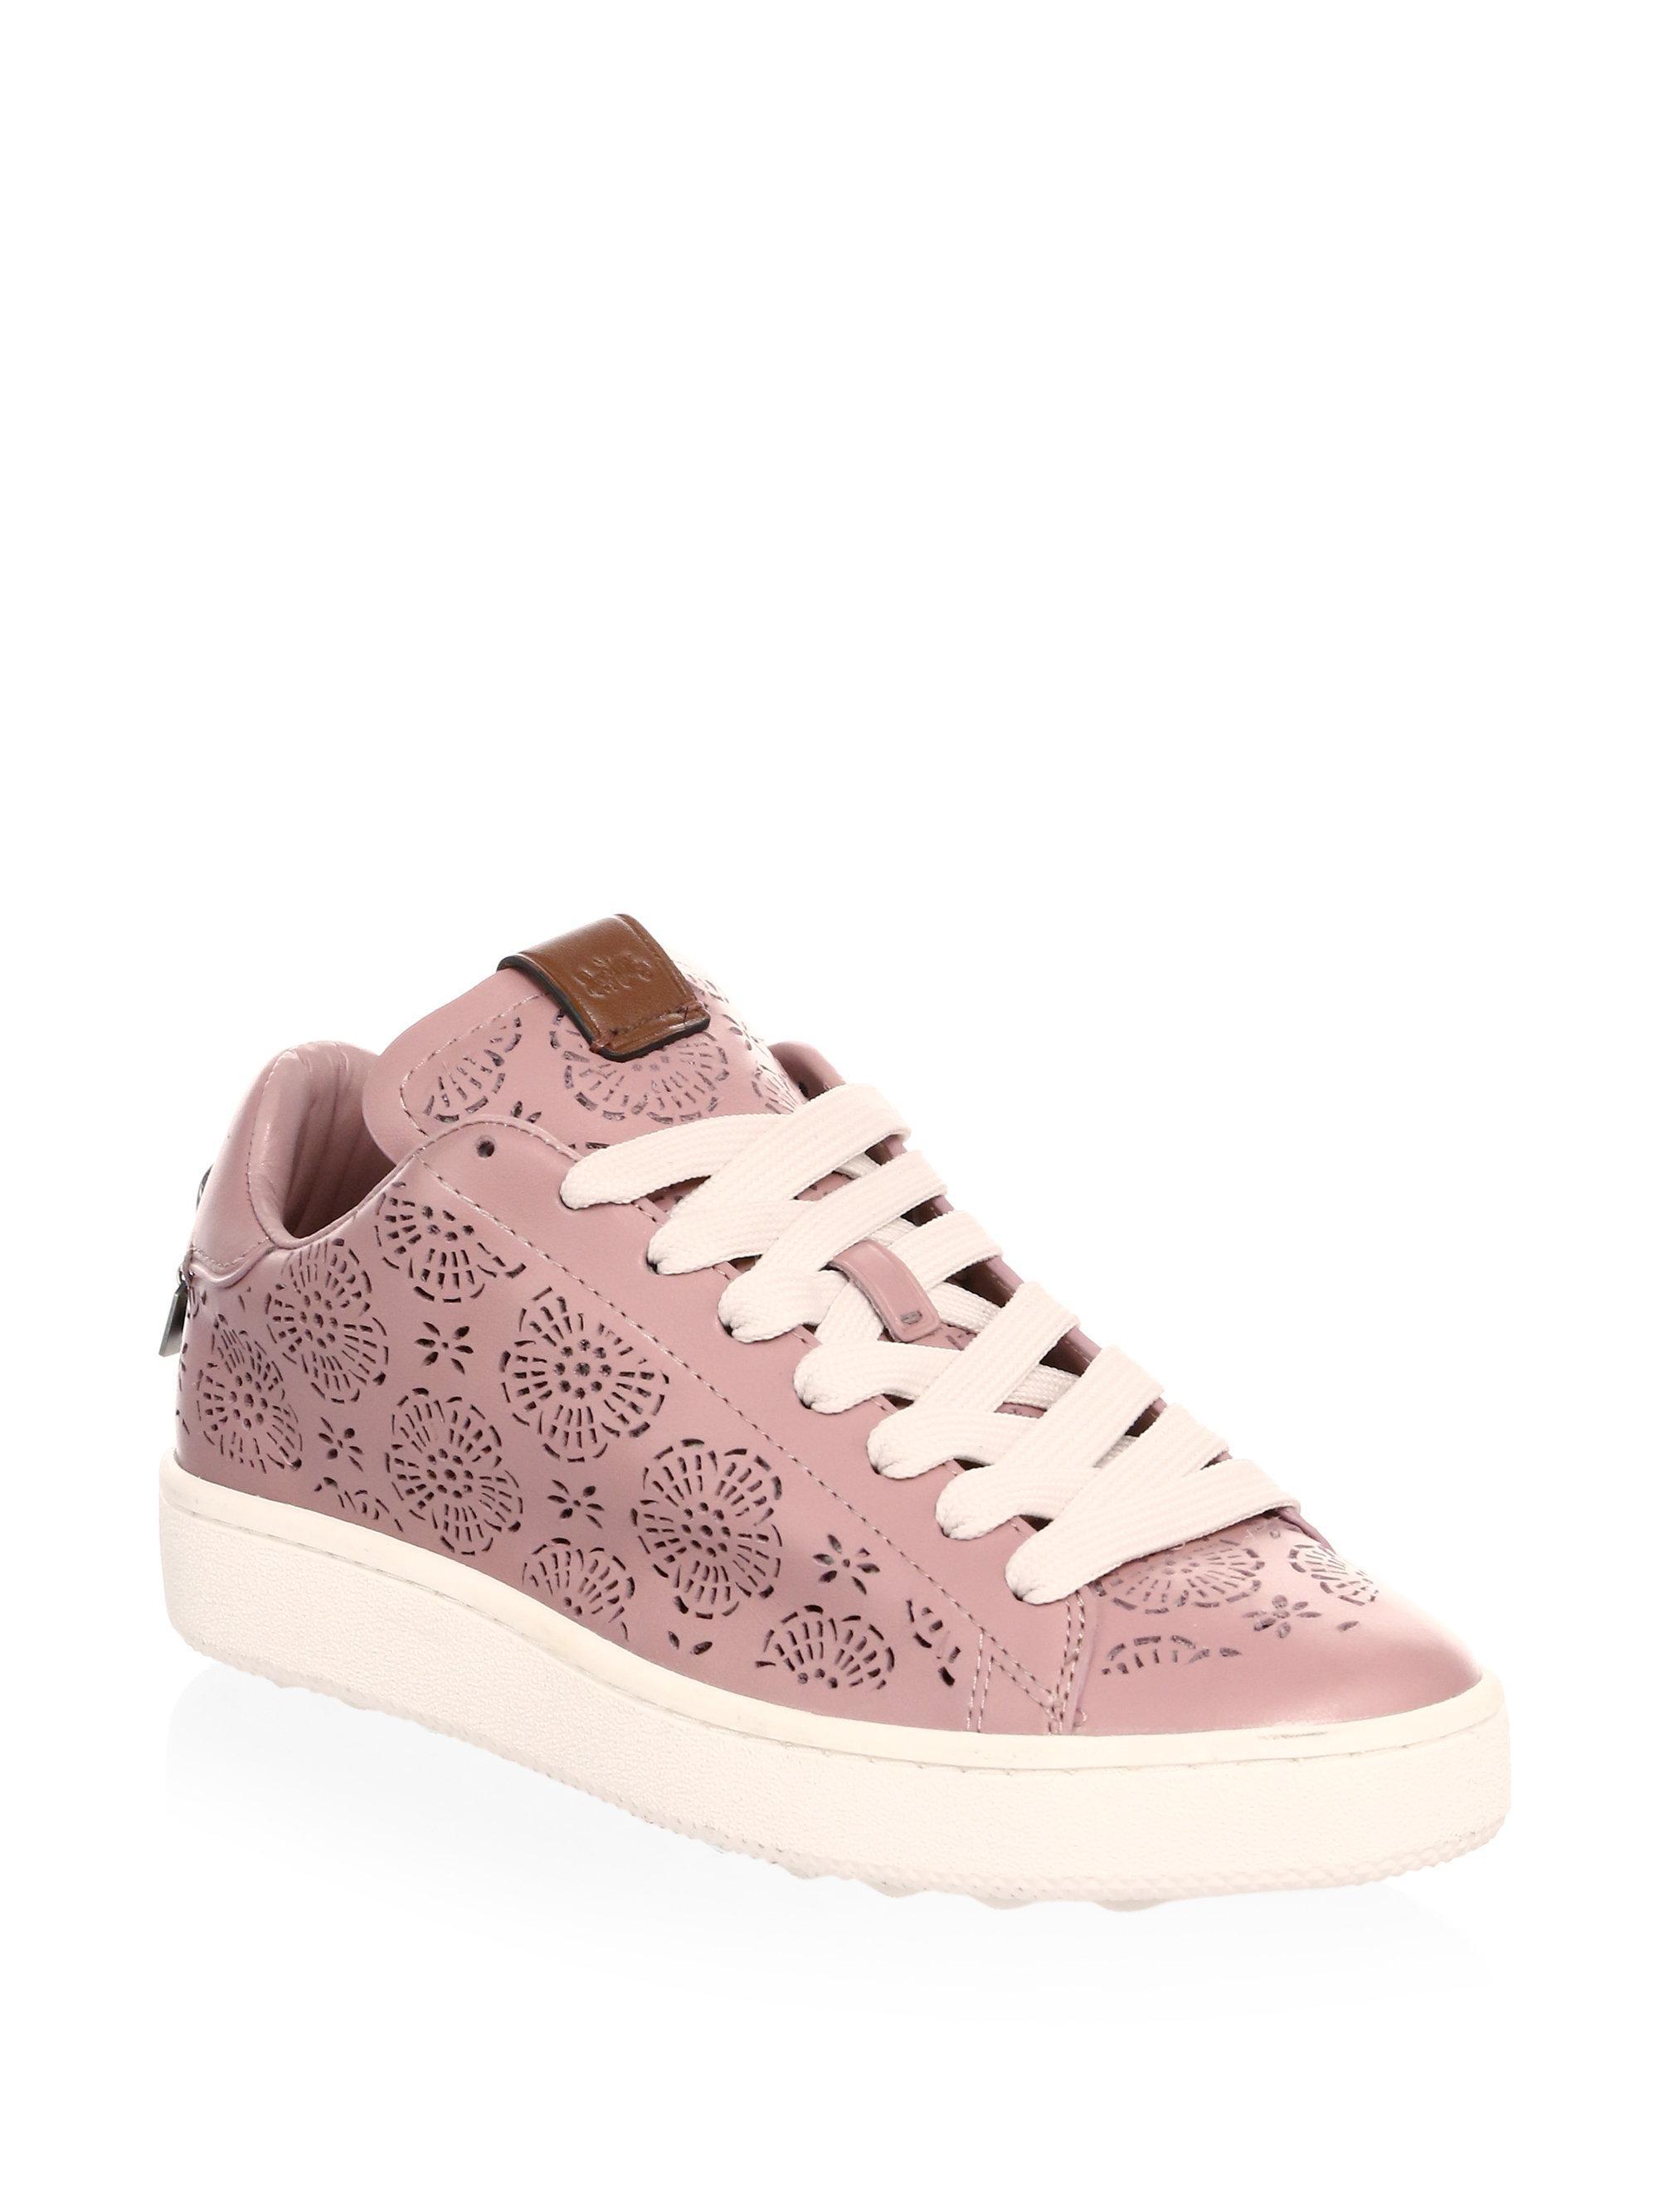 C101 cut-out sneakers - Pink & Purple Coach KyyMVxHf